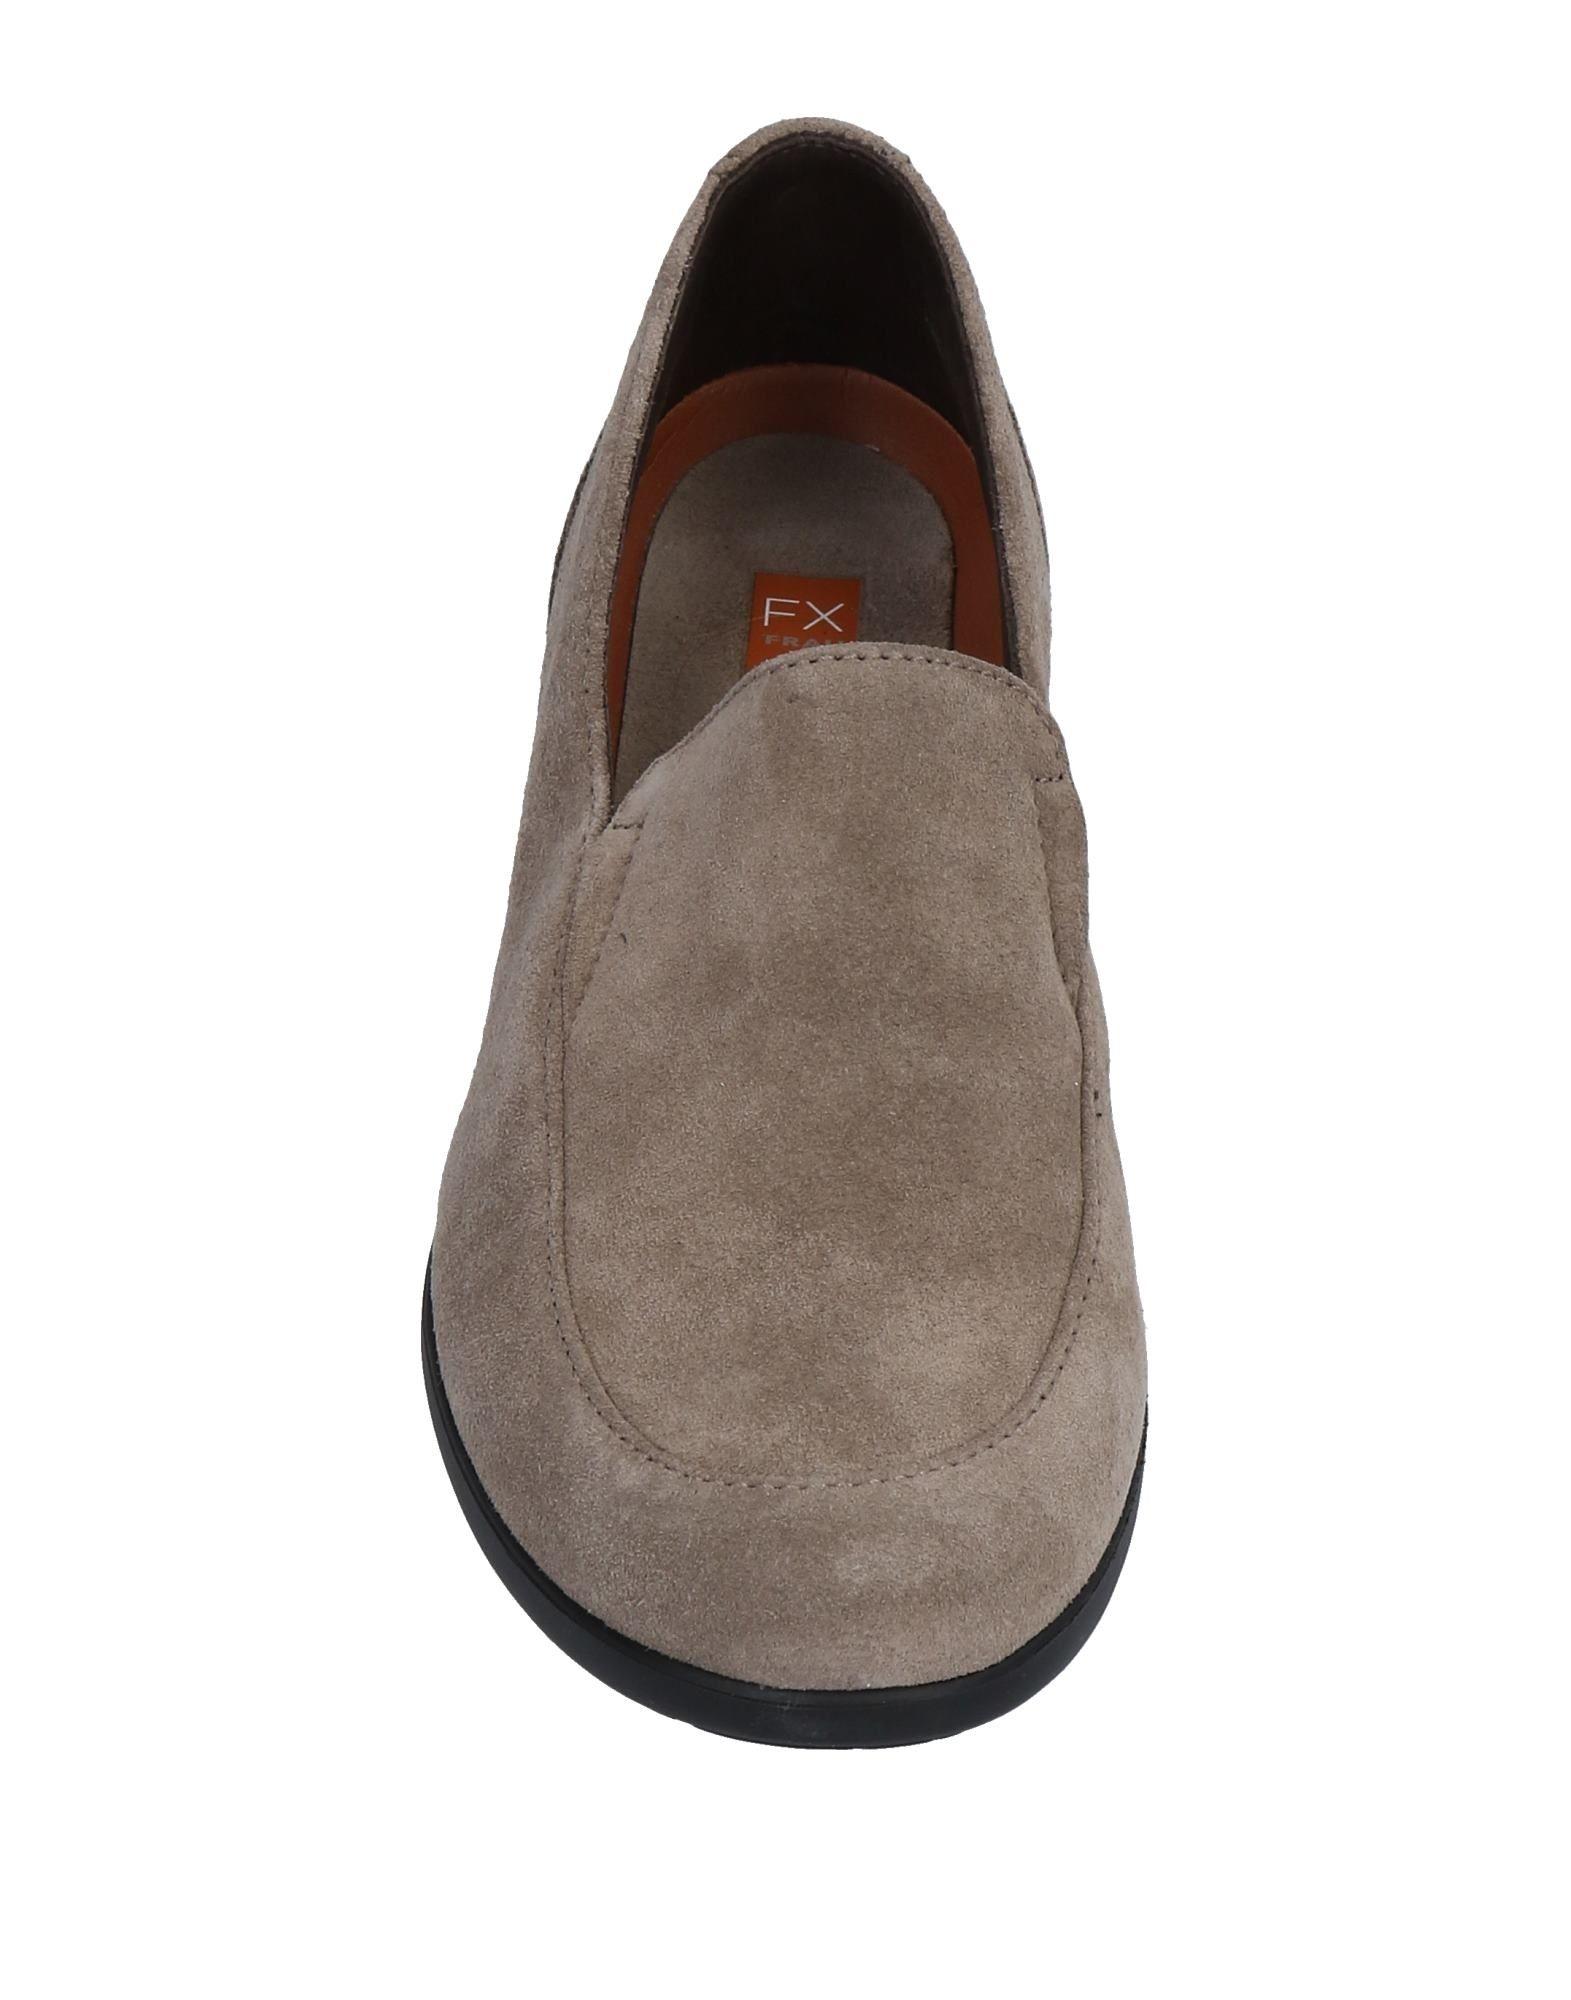 Fx Frau Mokassins Damen  Schuhe 11480577TJ Gute Qualität beliebte Schuhe  ad65eb